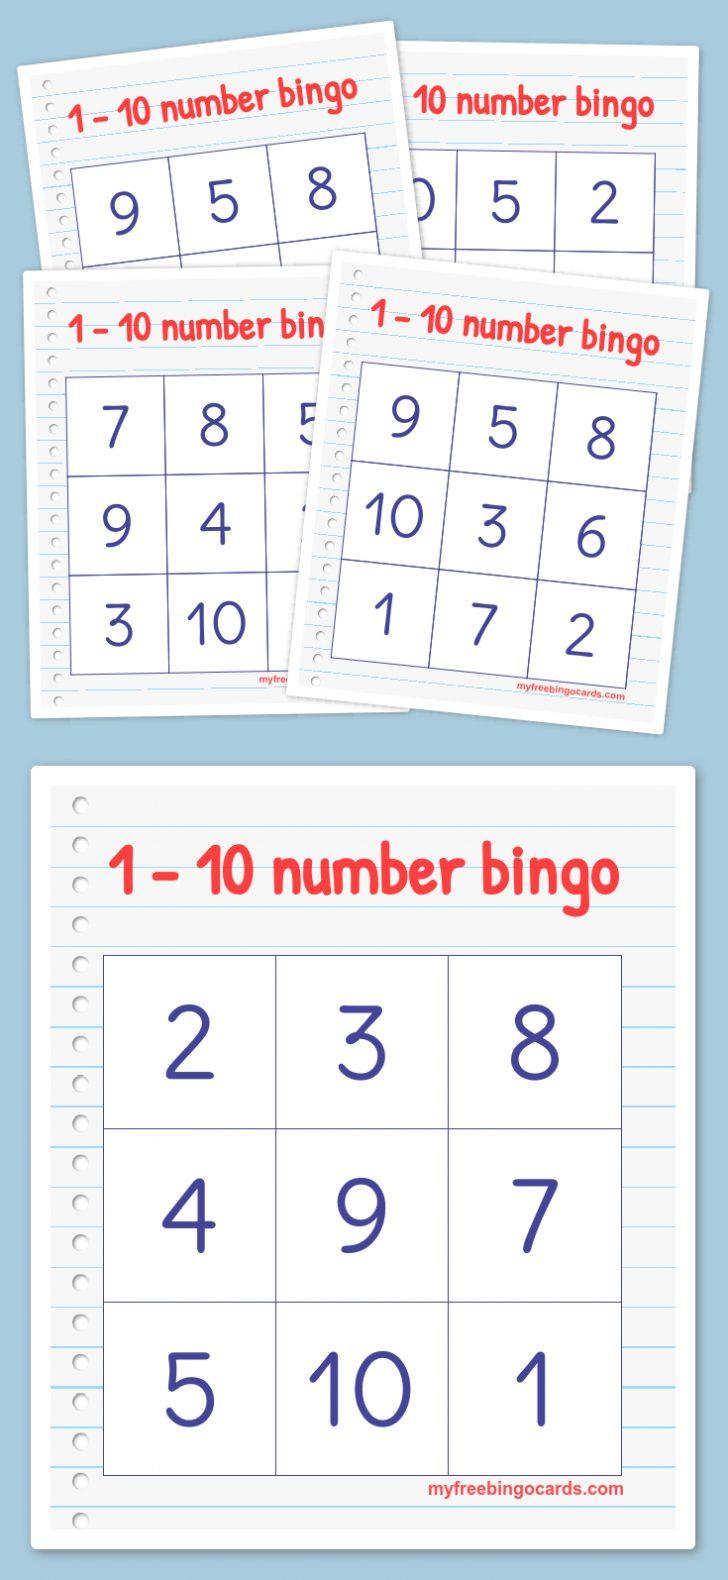 Free Printable Bingo Cardsprintable Bingo Cards